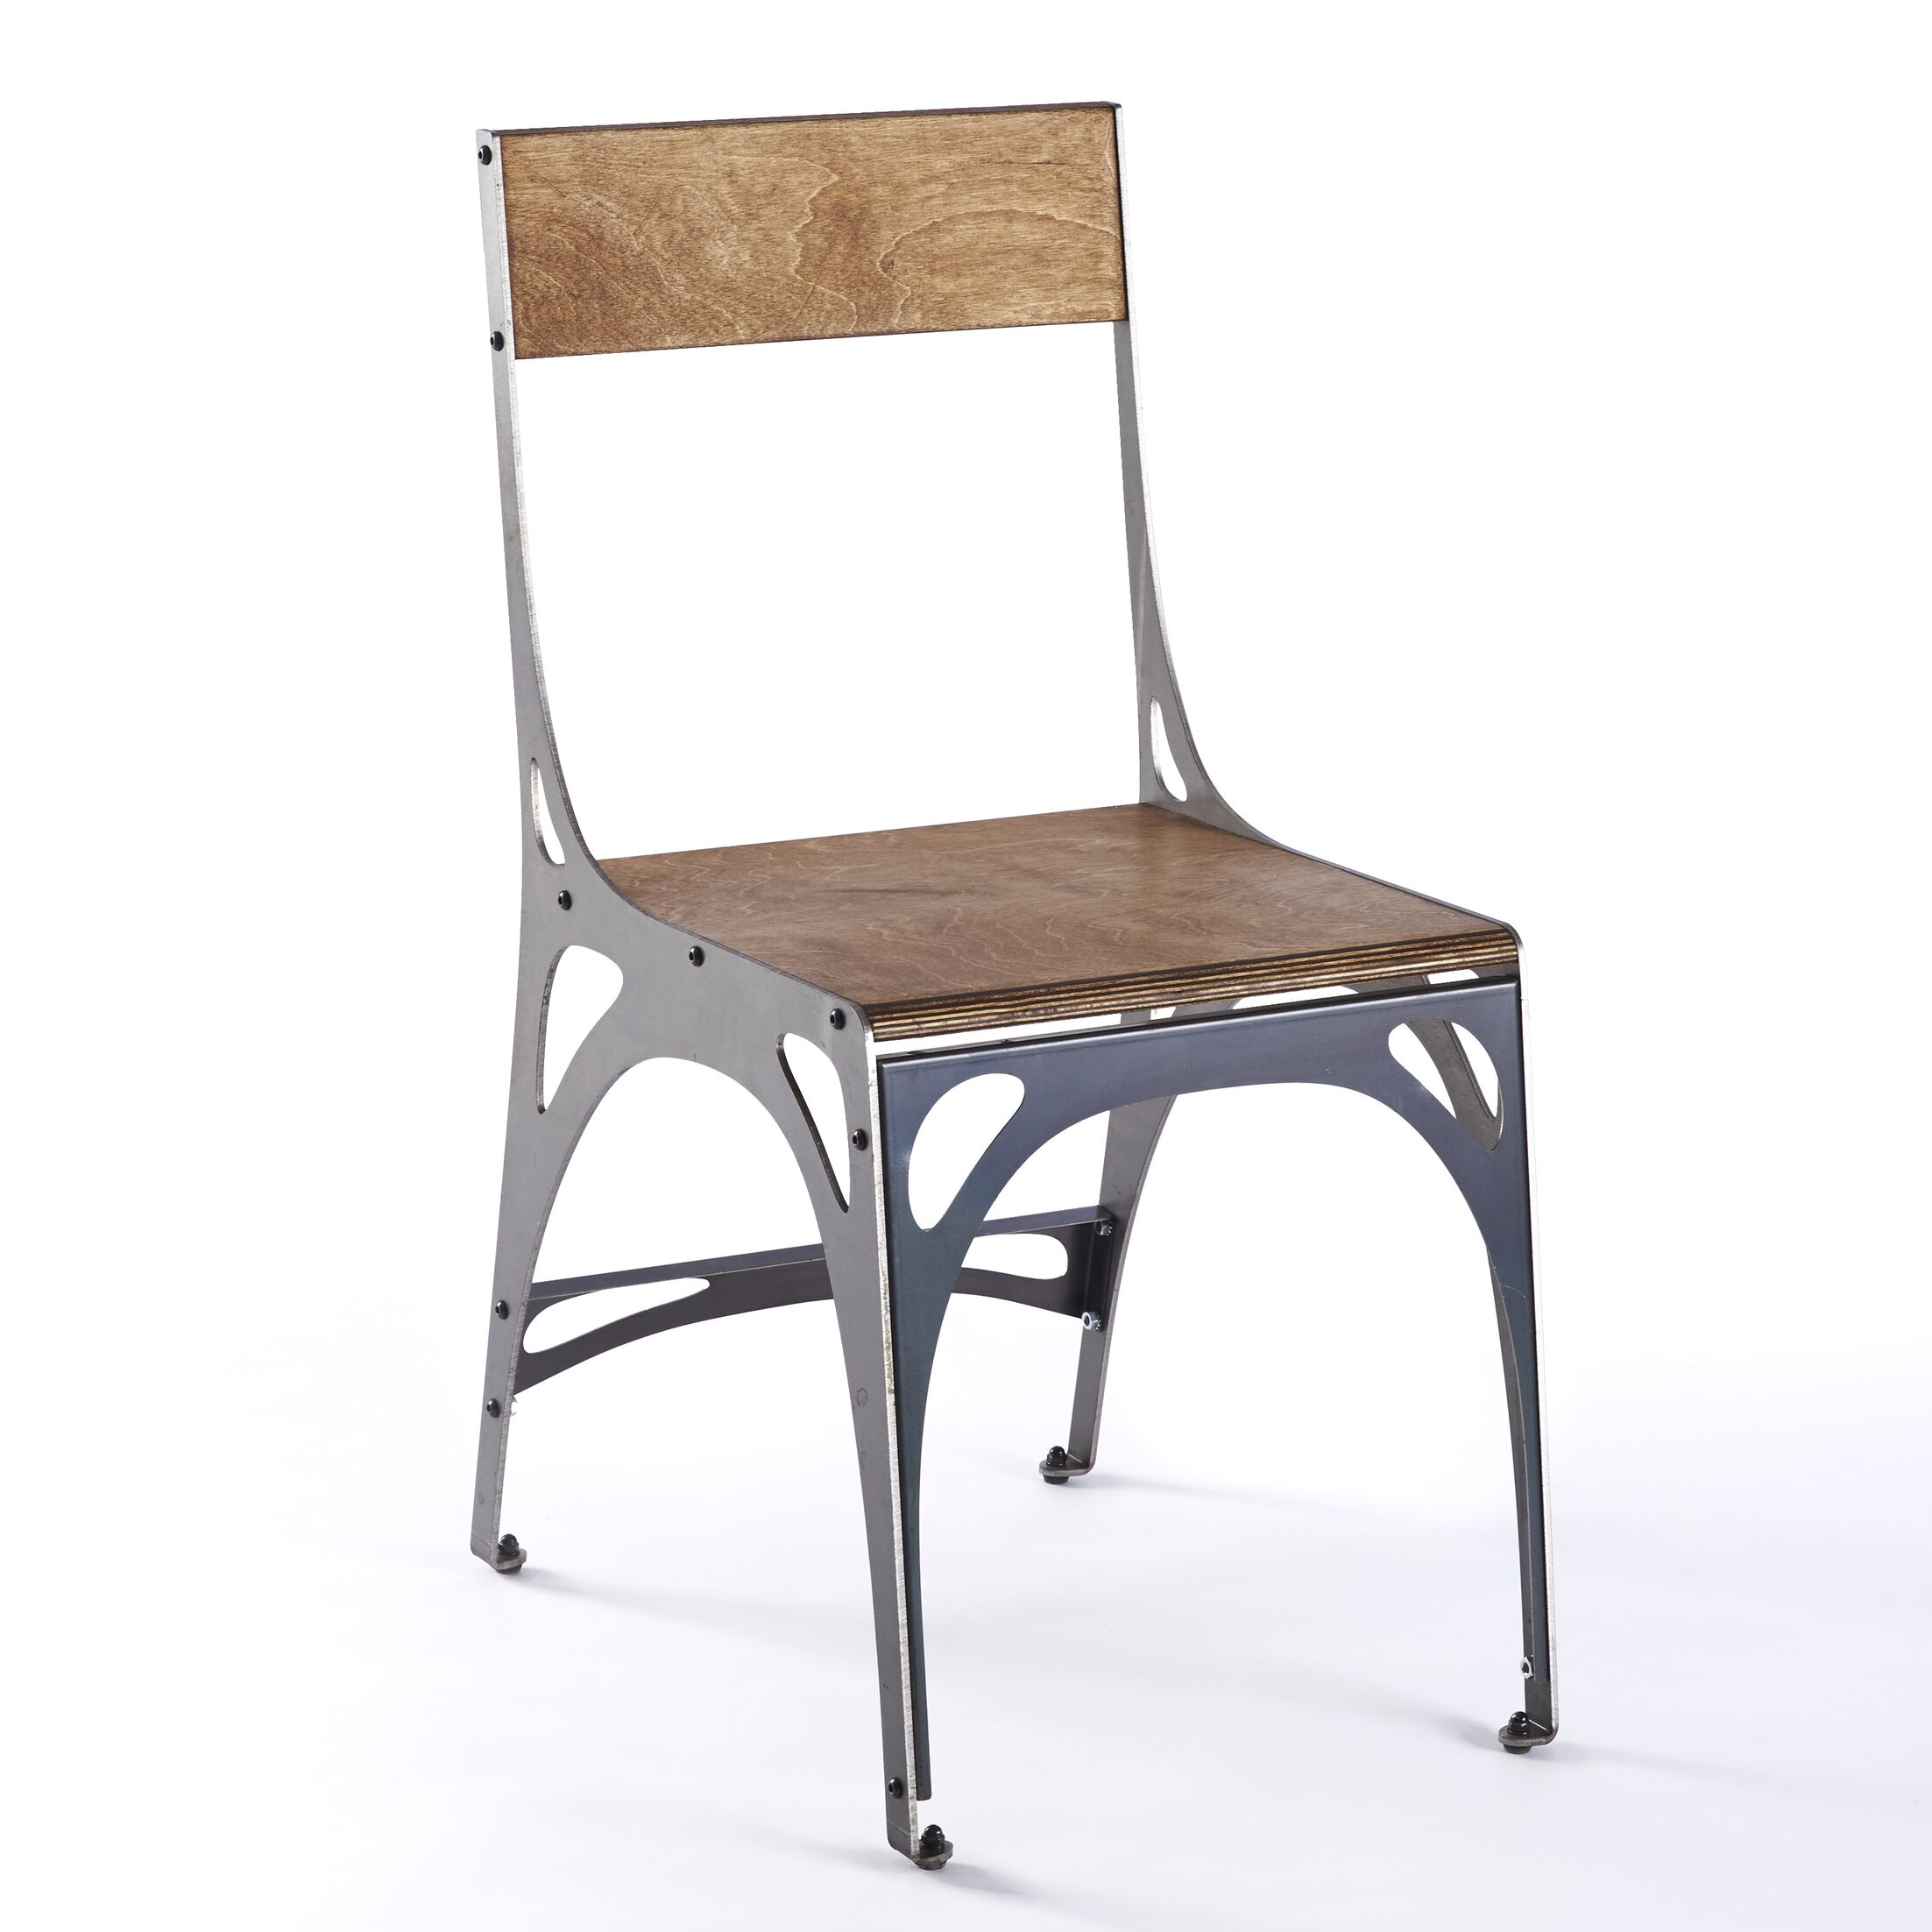 Mark 1 Side Chair Finish: Raw Steel